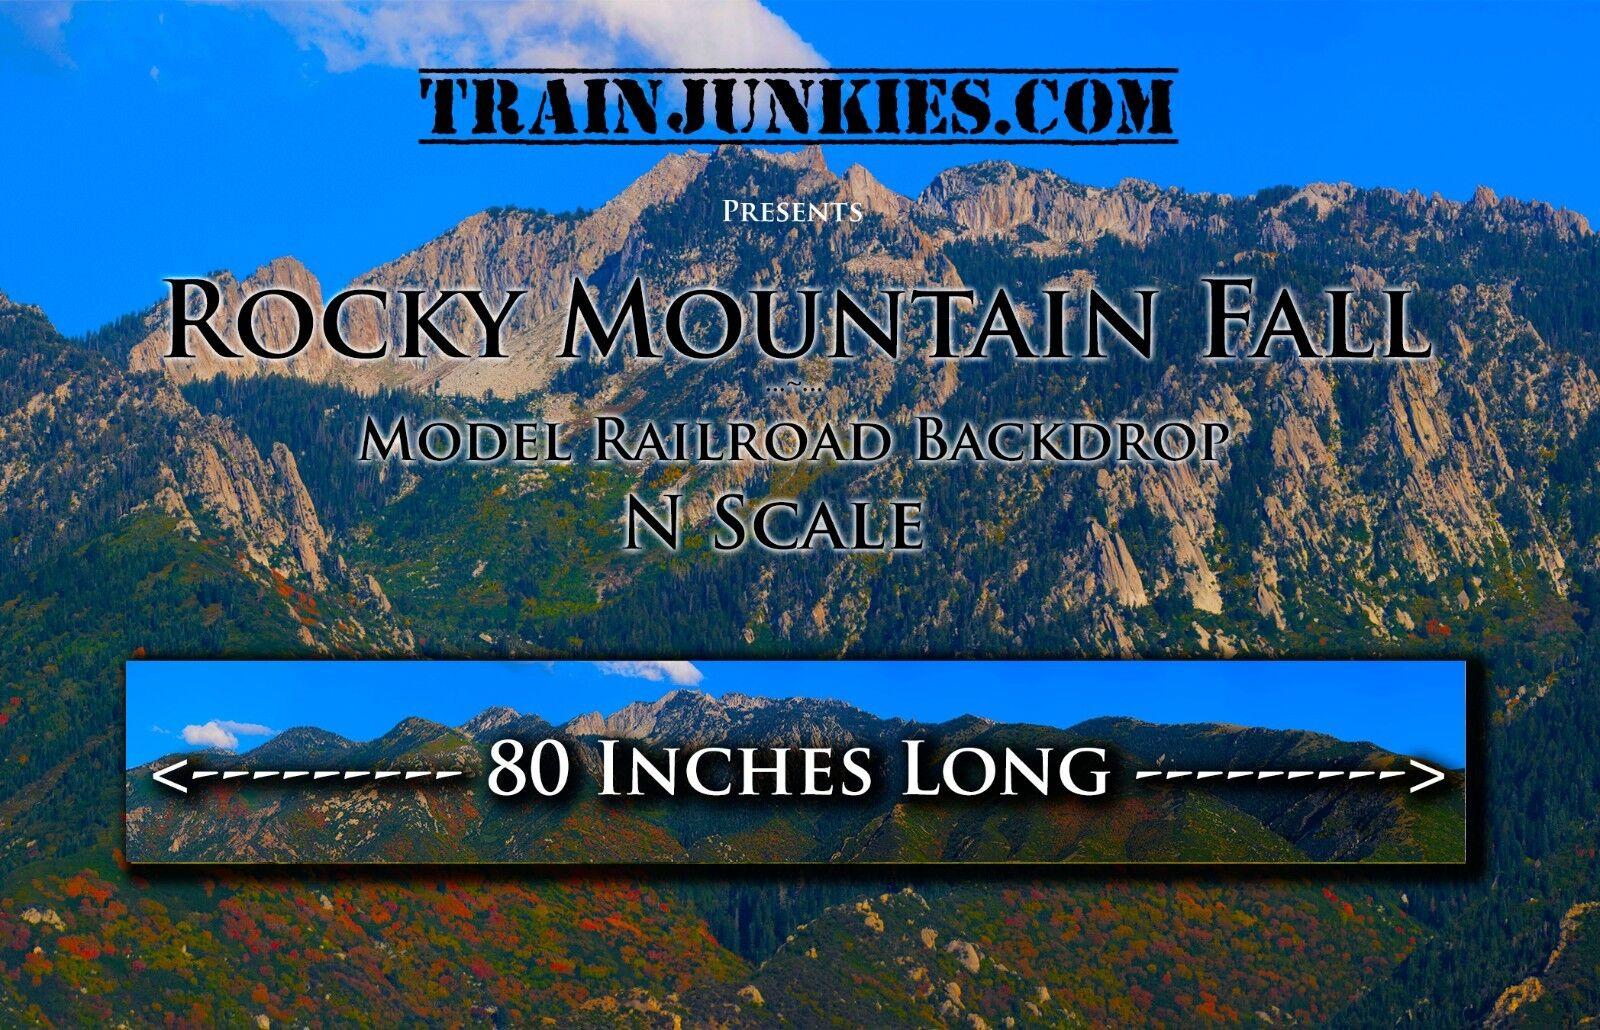 nuevo estilo Trainjunkies N scale  Rocky Rocky Rocky Mountain caída  modelo del ferroCocheril telón de fondo 12 x80   compras en linea